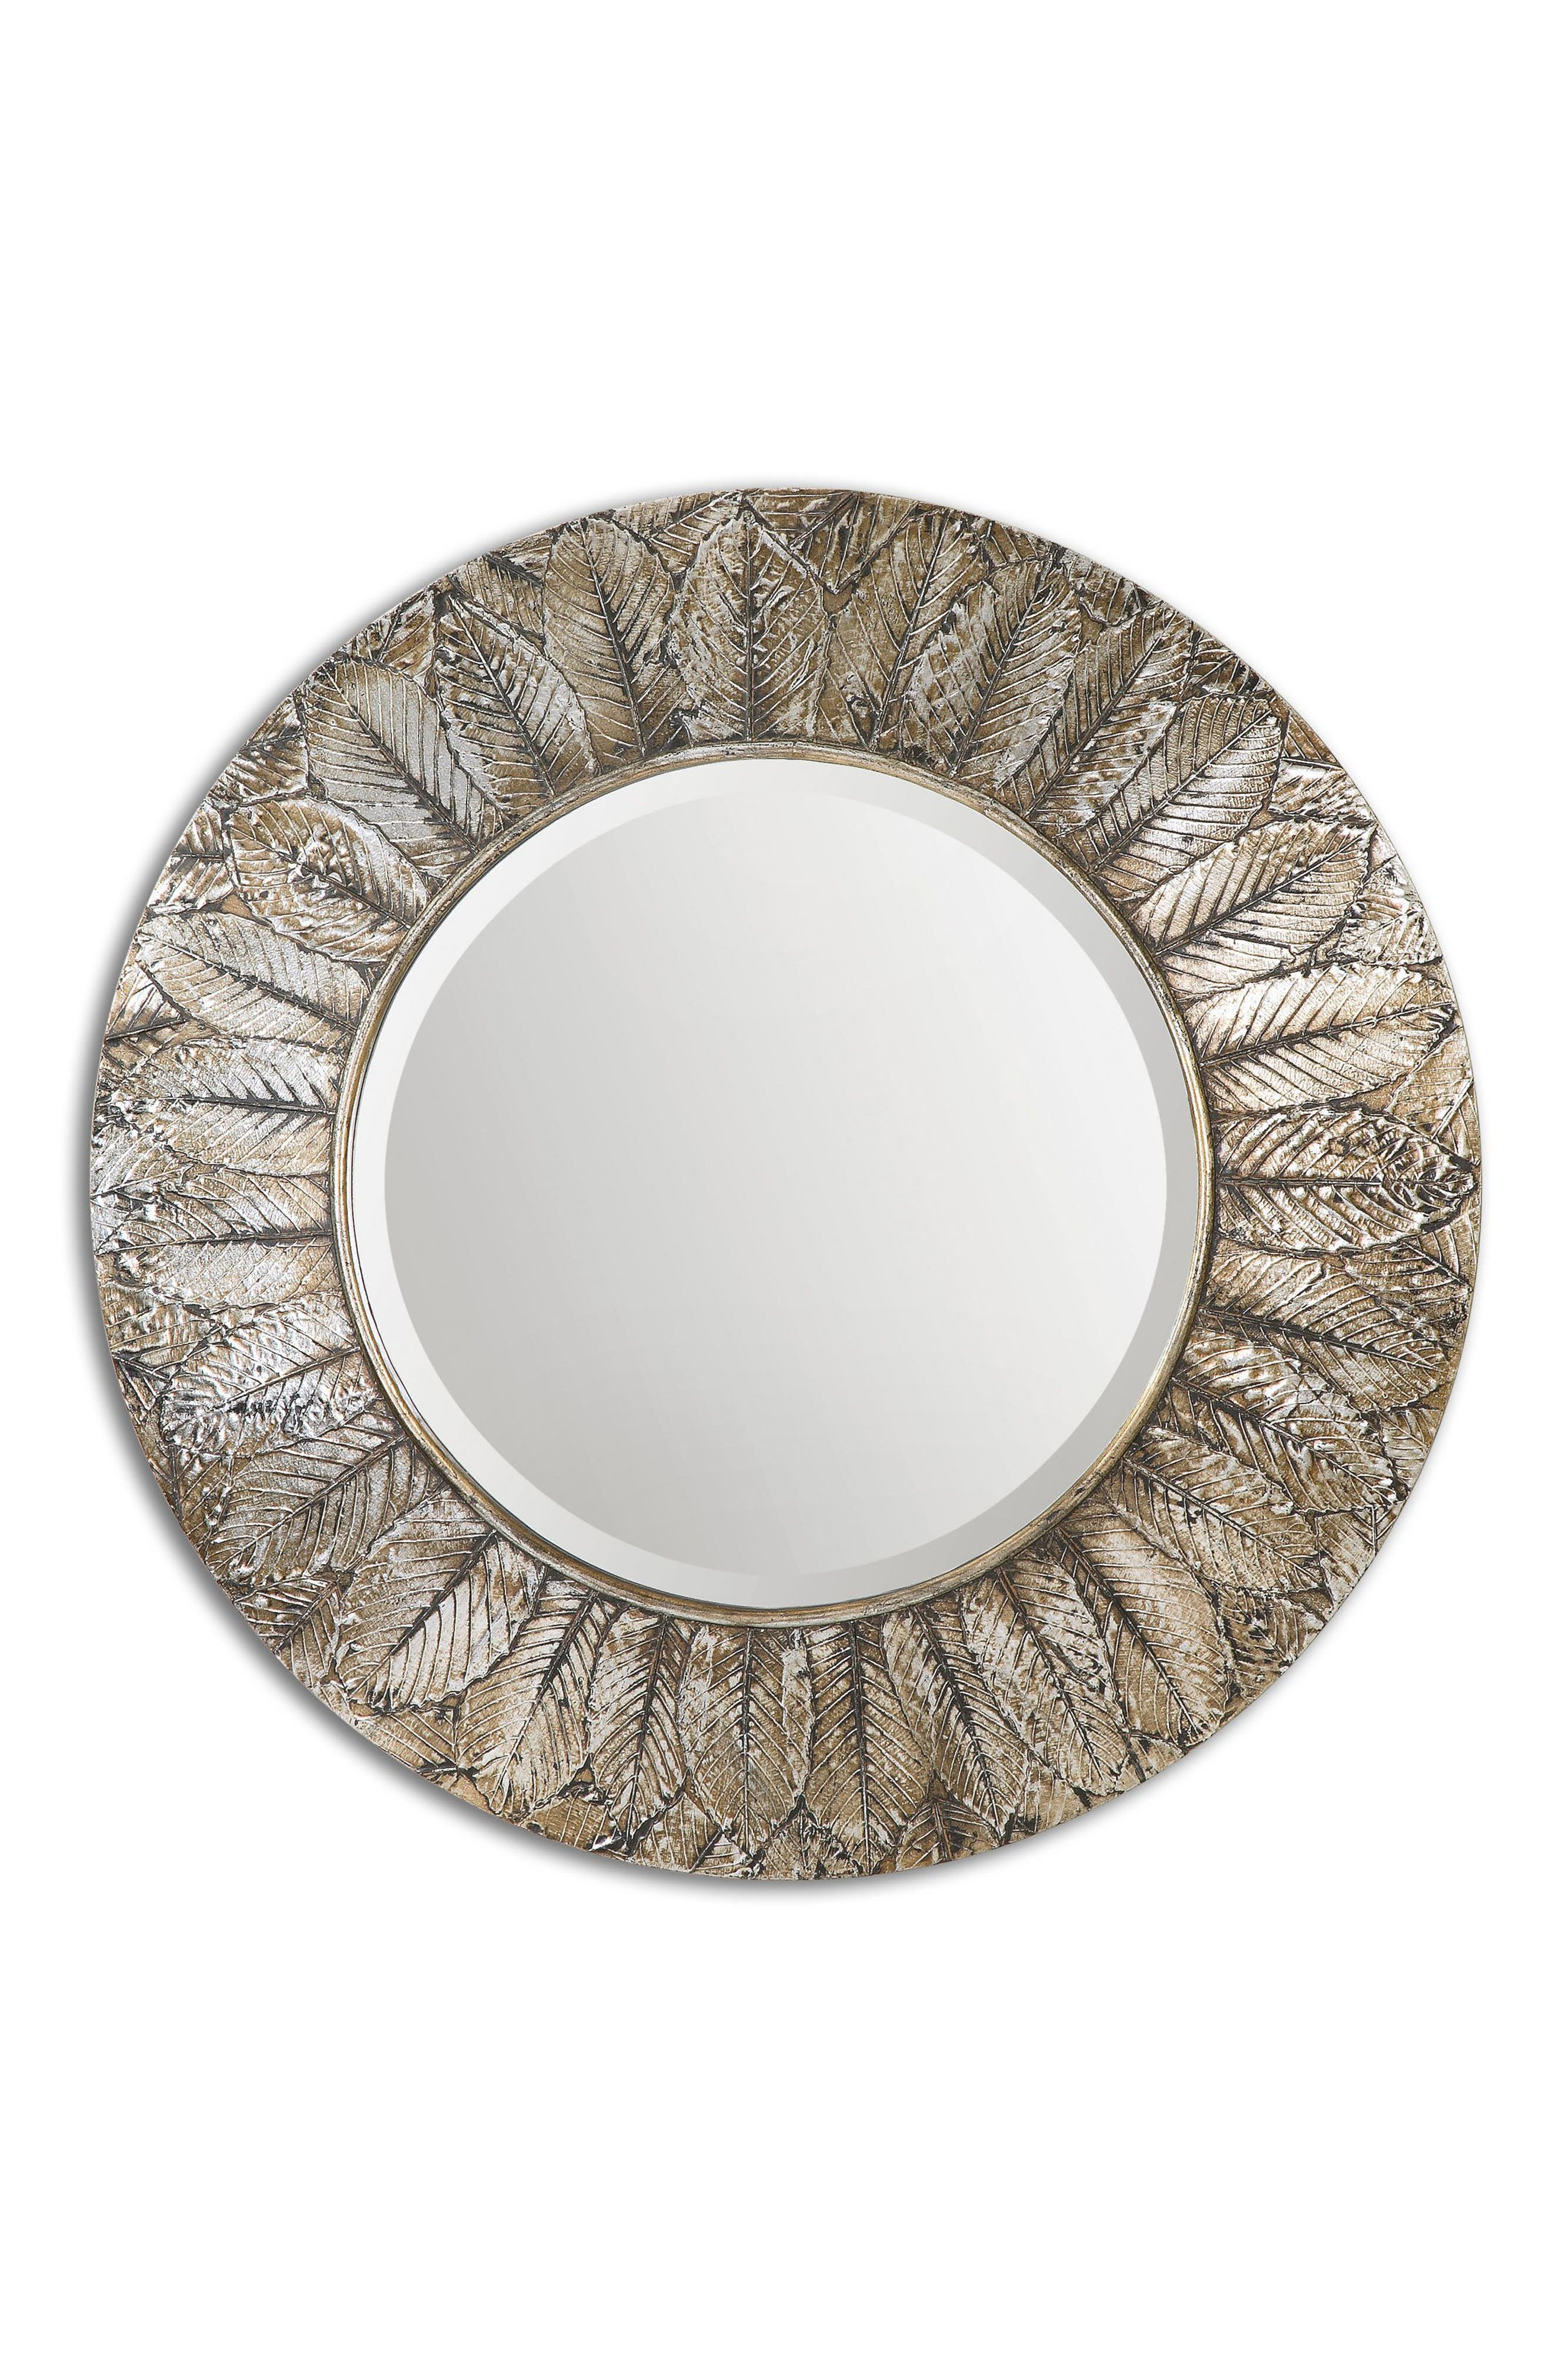 Uttermost Foliage Wall Mirror